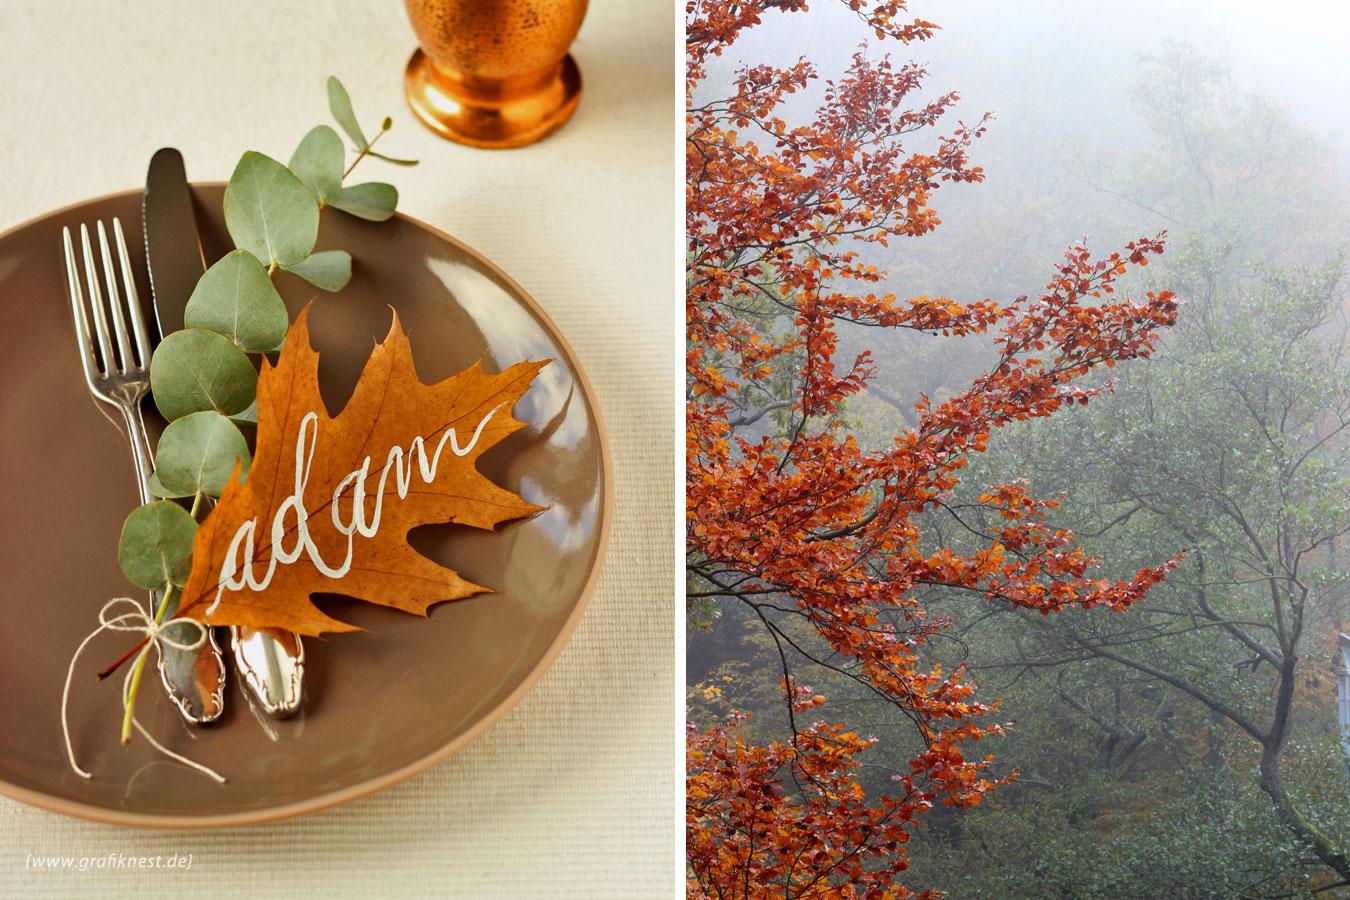 Hand Lettering auf Herbst Blatt